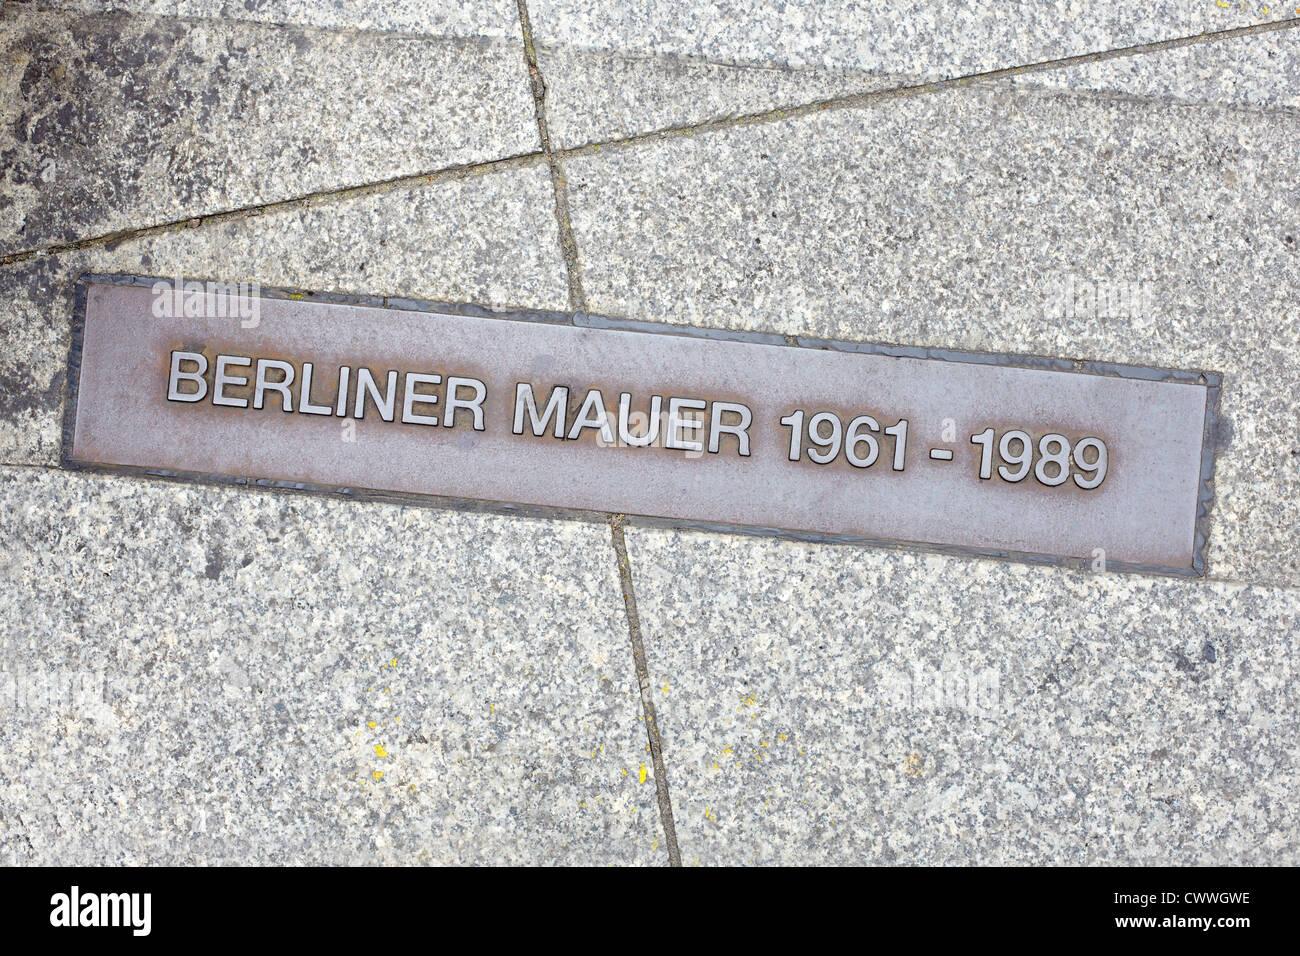 Mur de Berlin signe sur la rue, Berliner Mauer Photo Stock